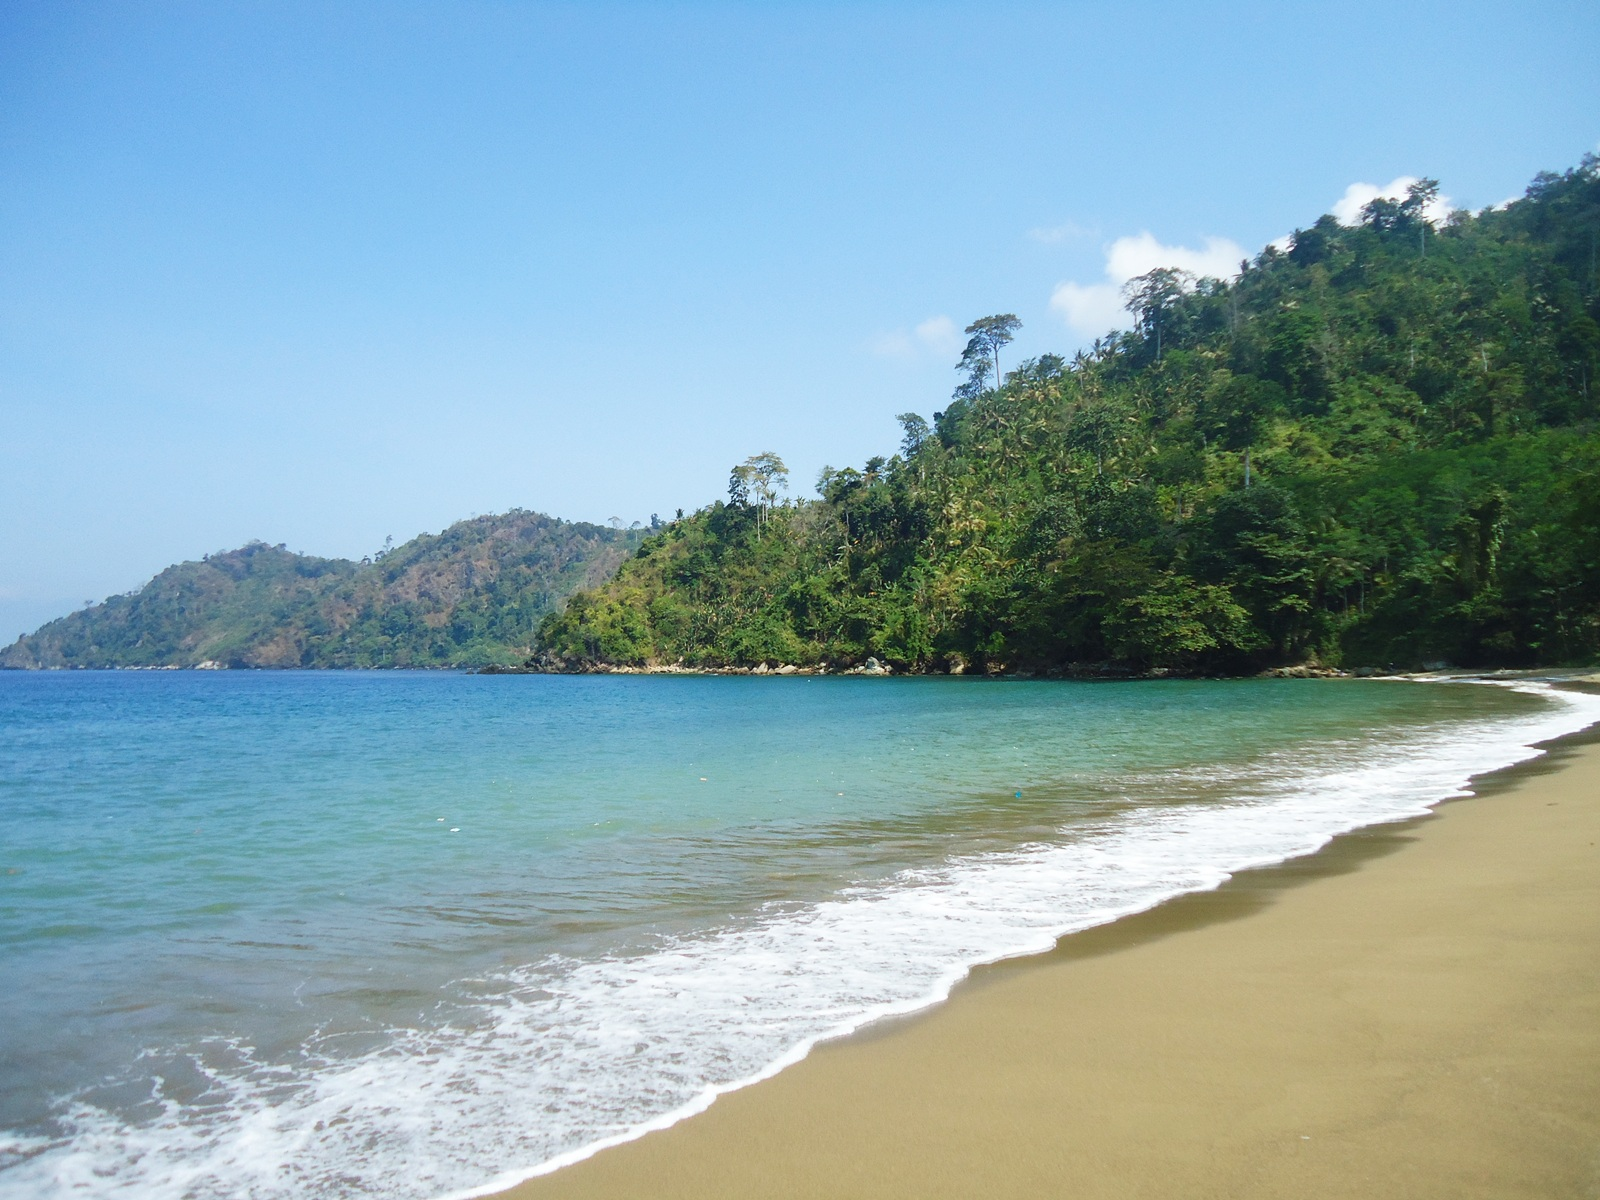 27 Wisata Pantai Hits Malang Deketin Sipelot Kaliapus Kab